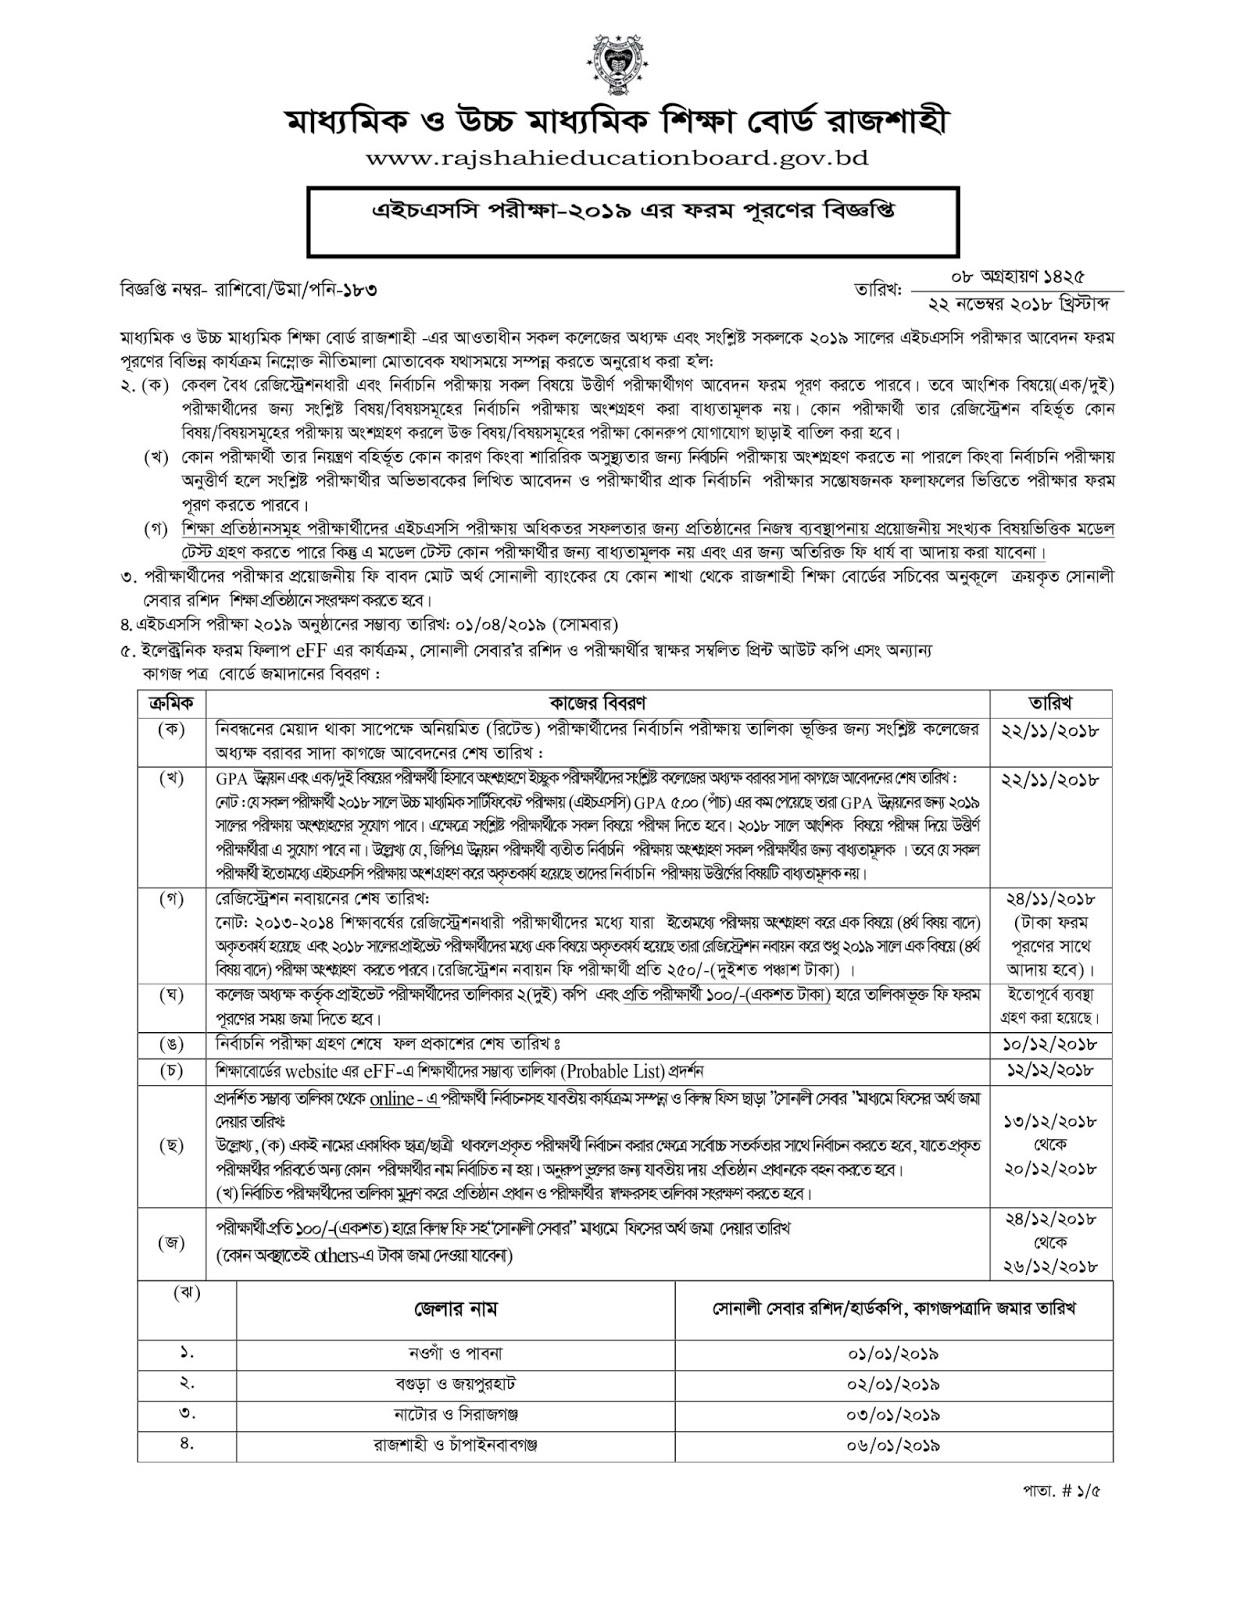 Rajshahi Board HSC EXAM 2019 Form Fill-Up Notice 2018